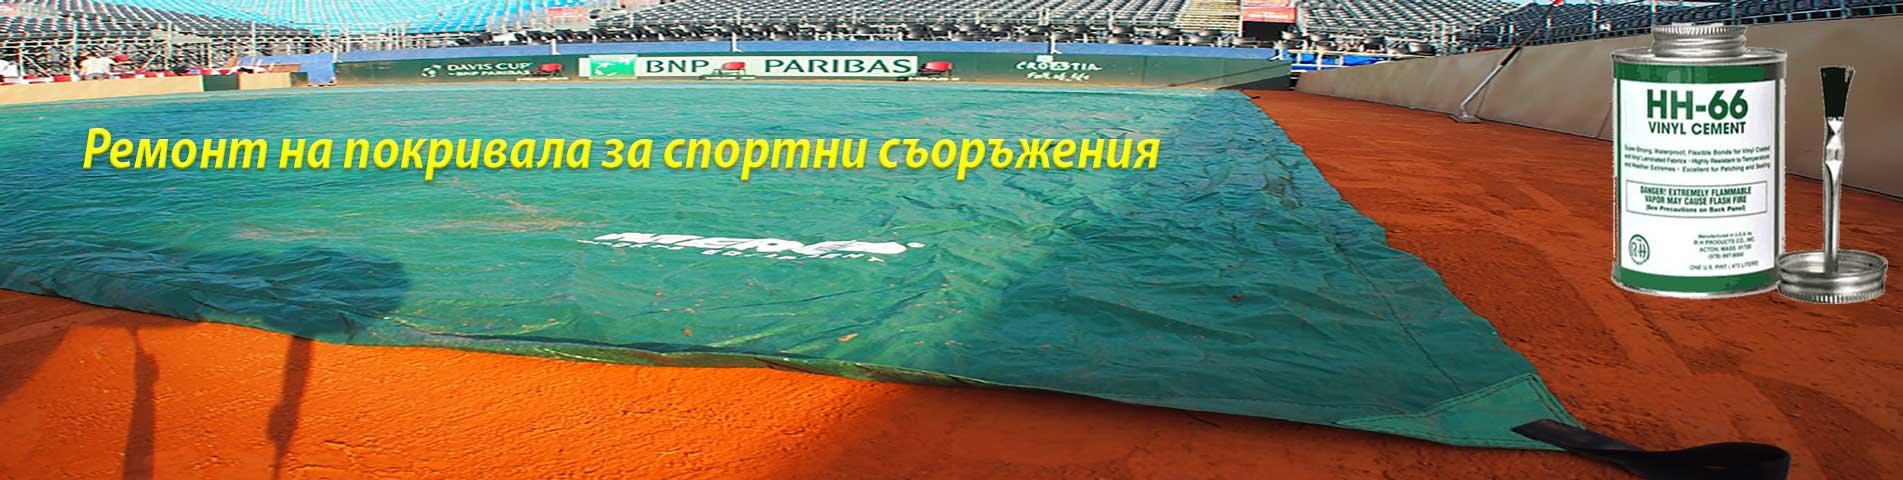 Sport terain covers